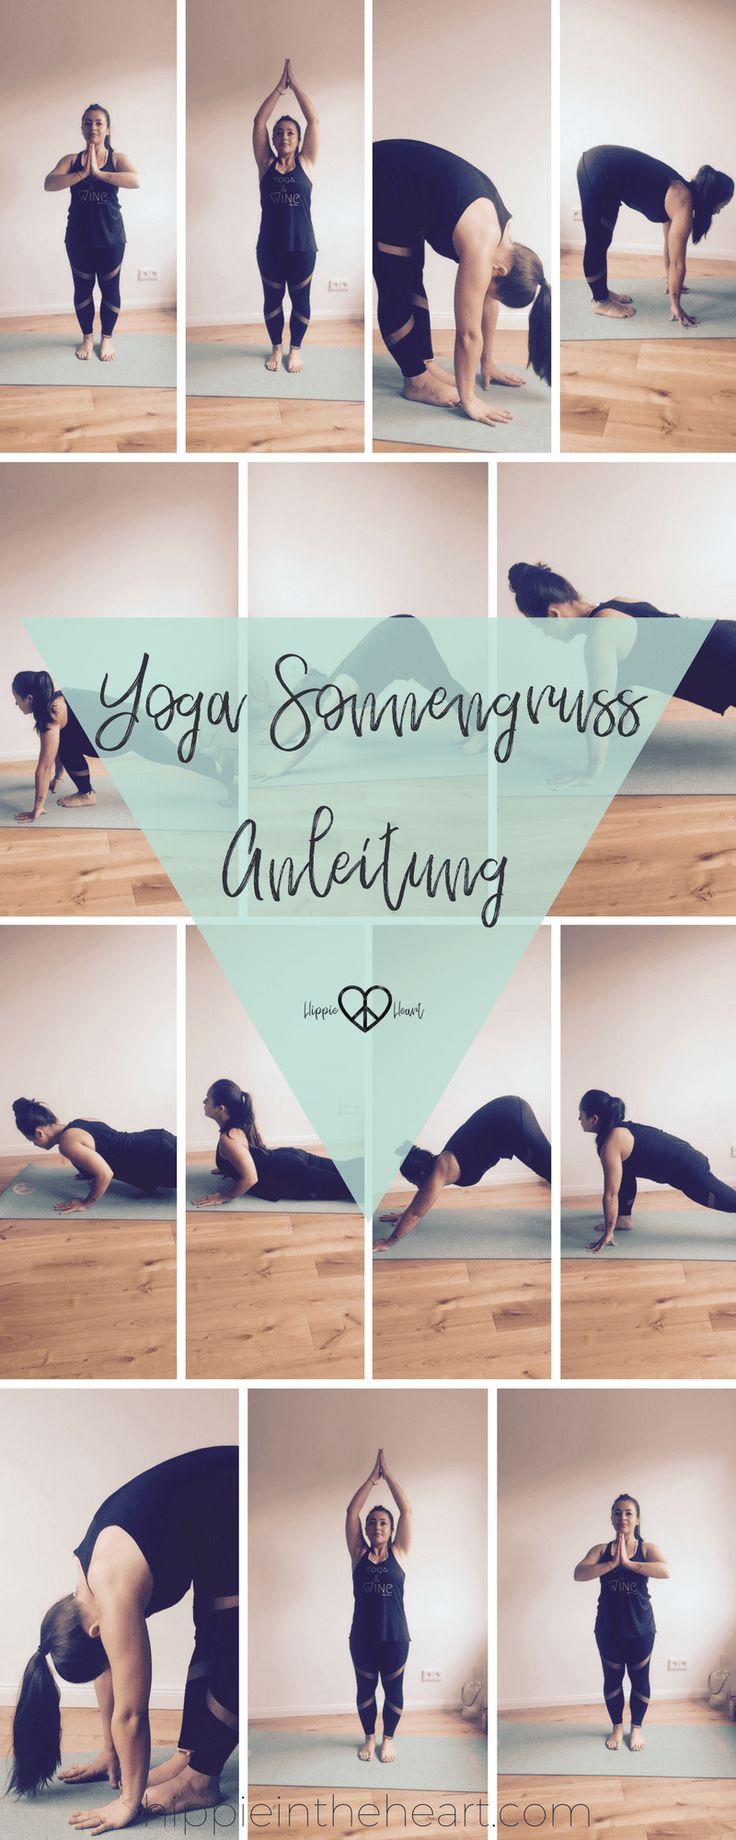 Yoga Sonnengruss - Eine Schritt für Schritt Anleitung - Pinterest 2